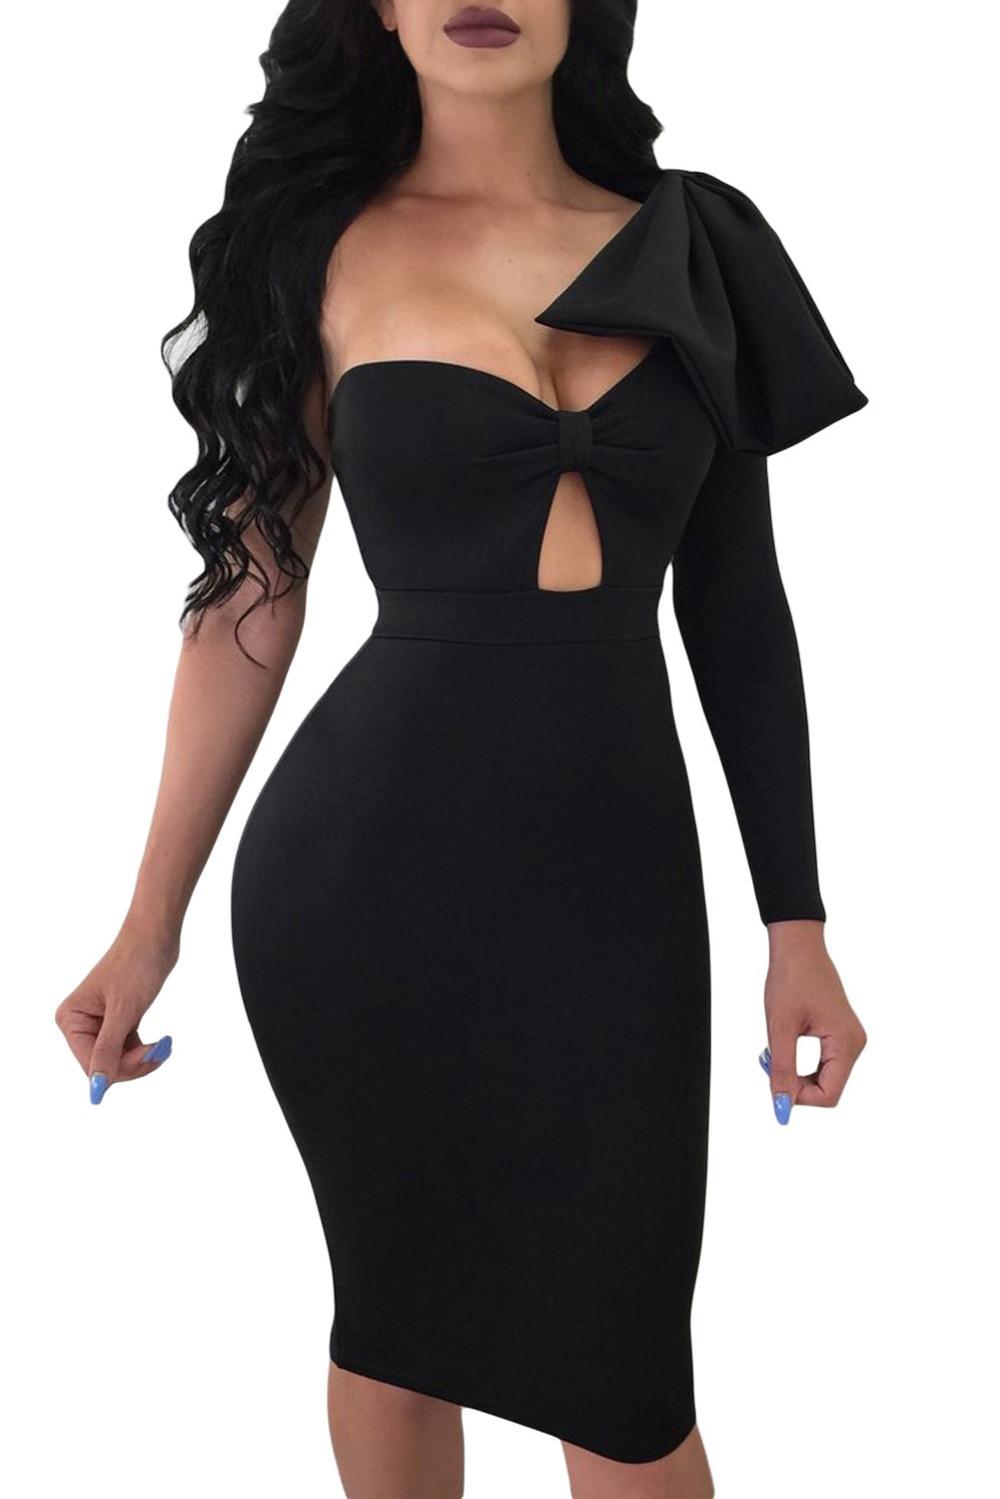 women's clothing new arrival female sexy clubwear night